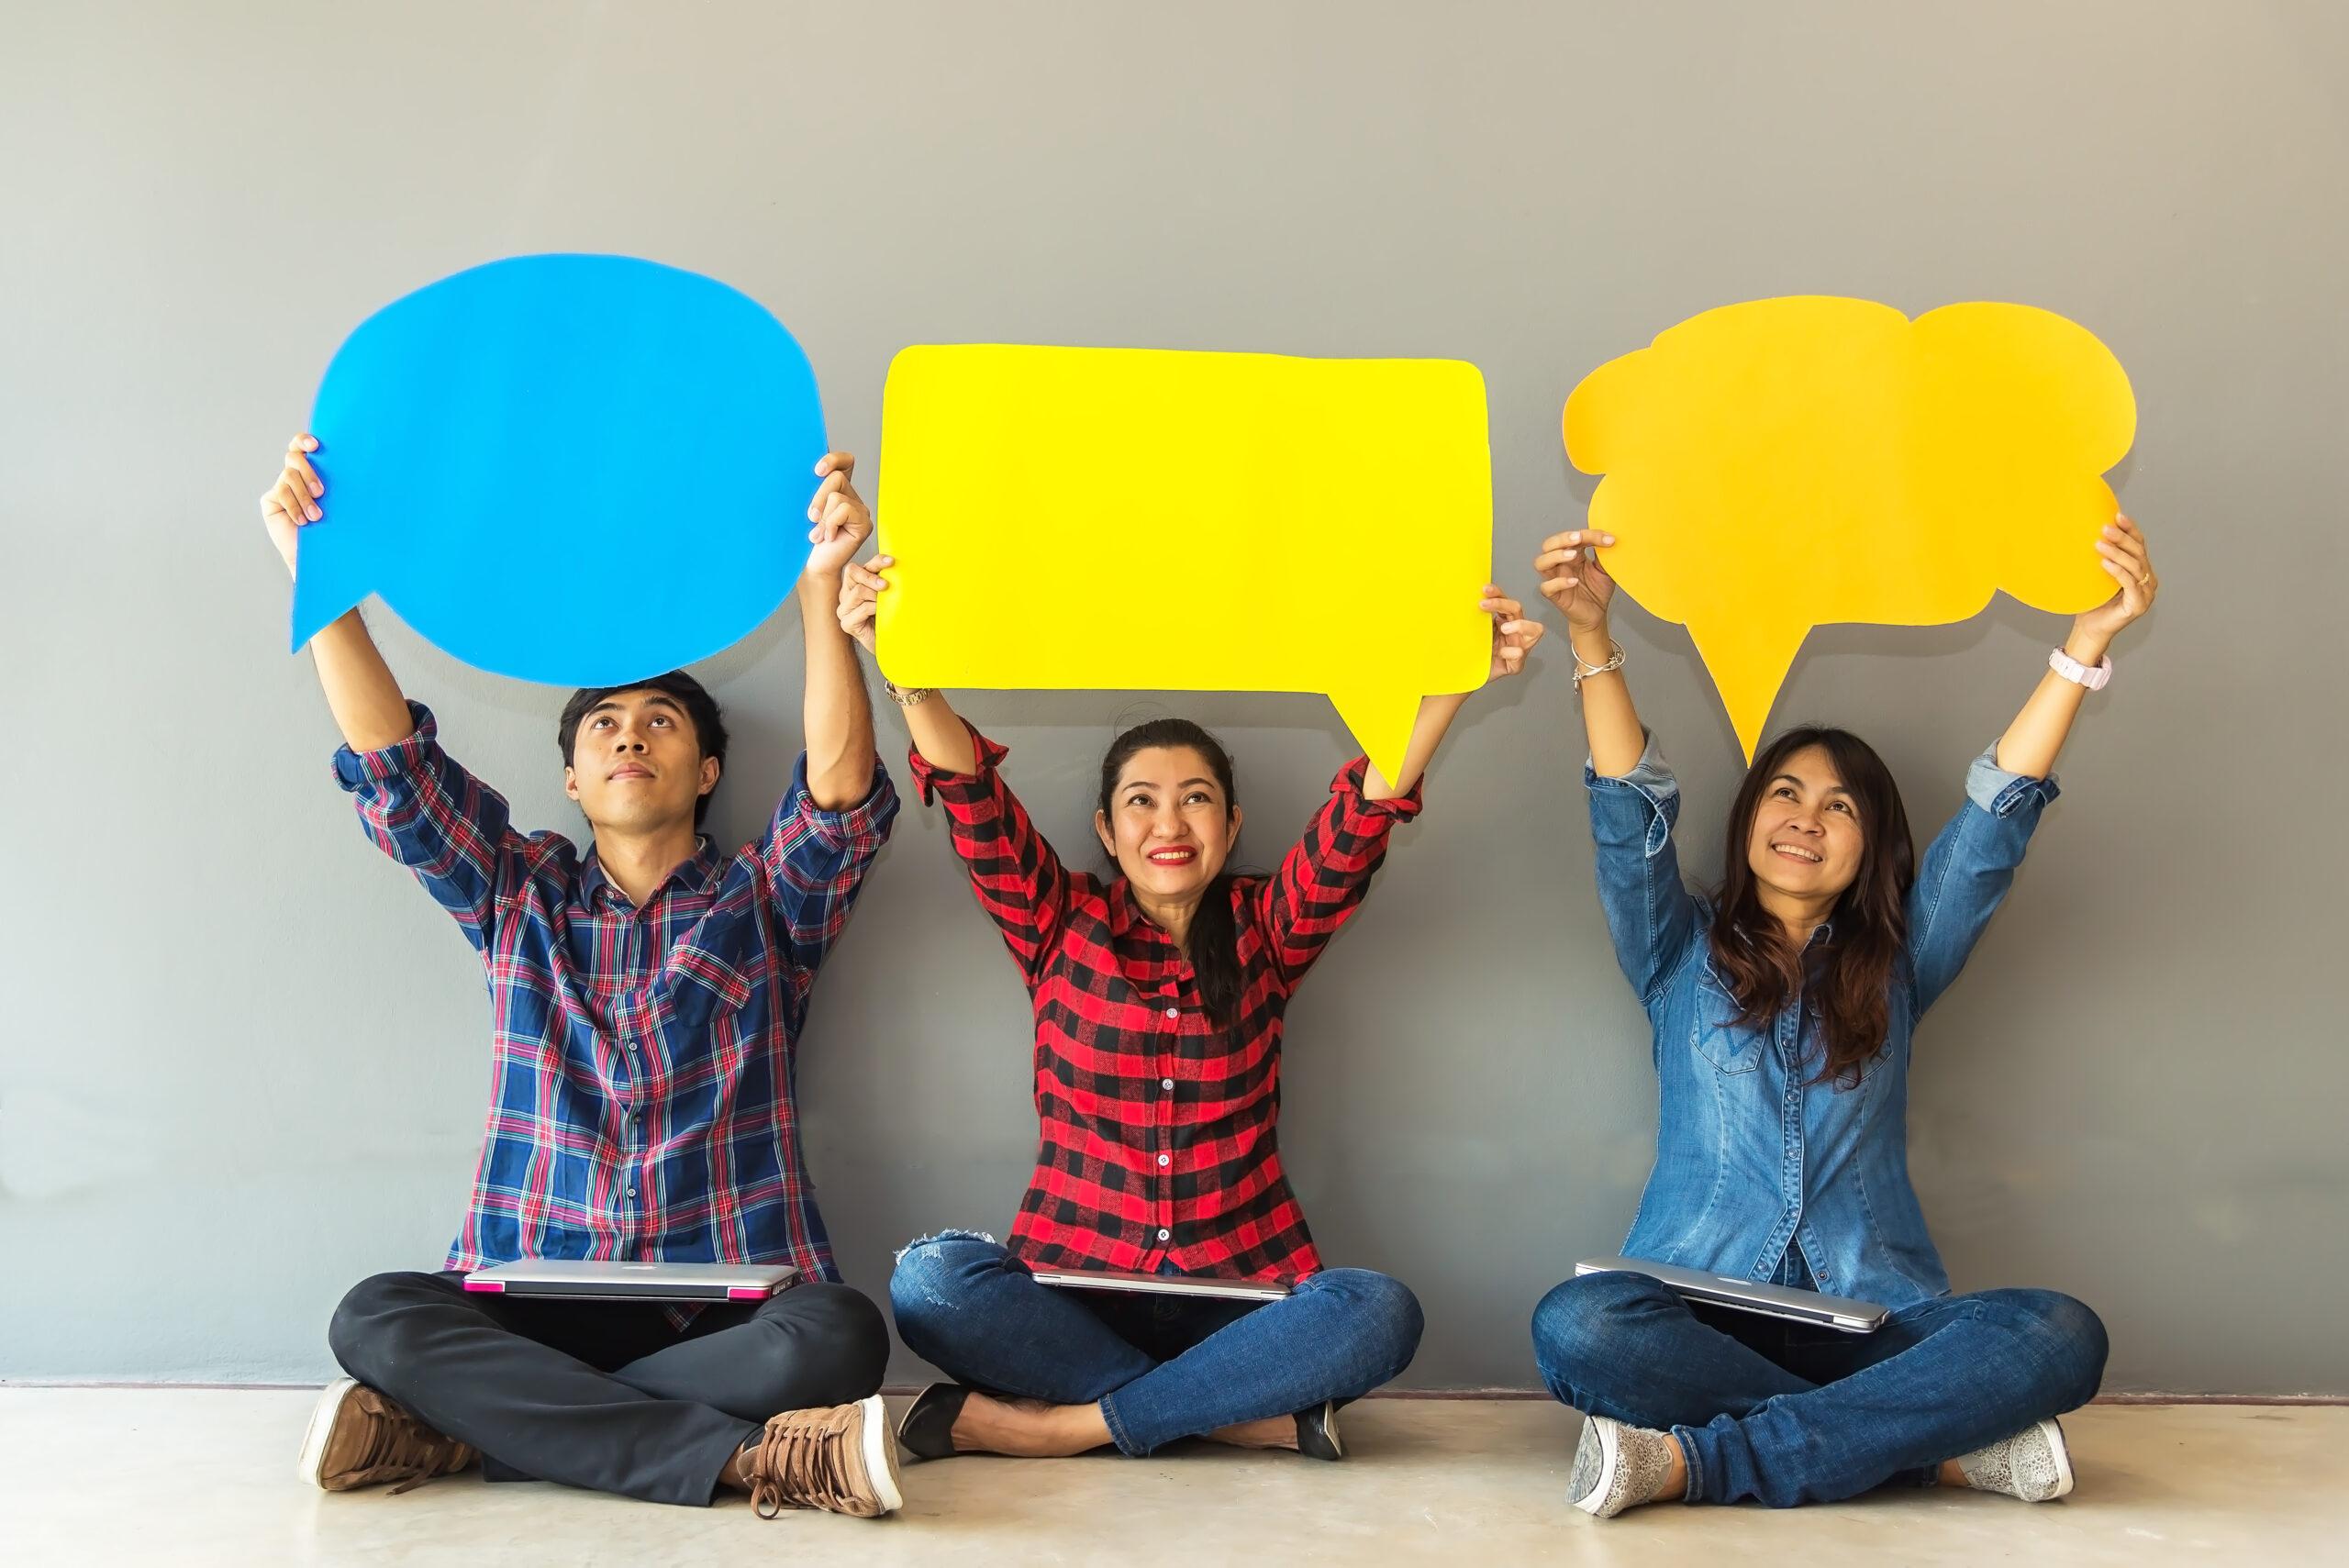 National Survey: Emotional Health Struggles Hit Most Households